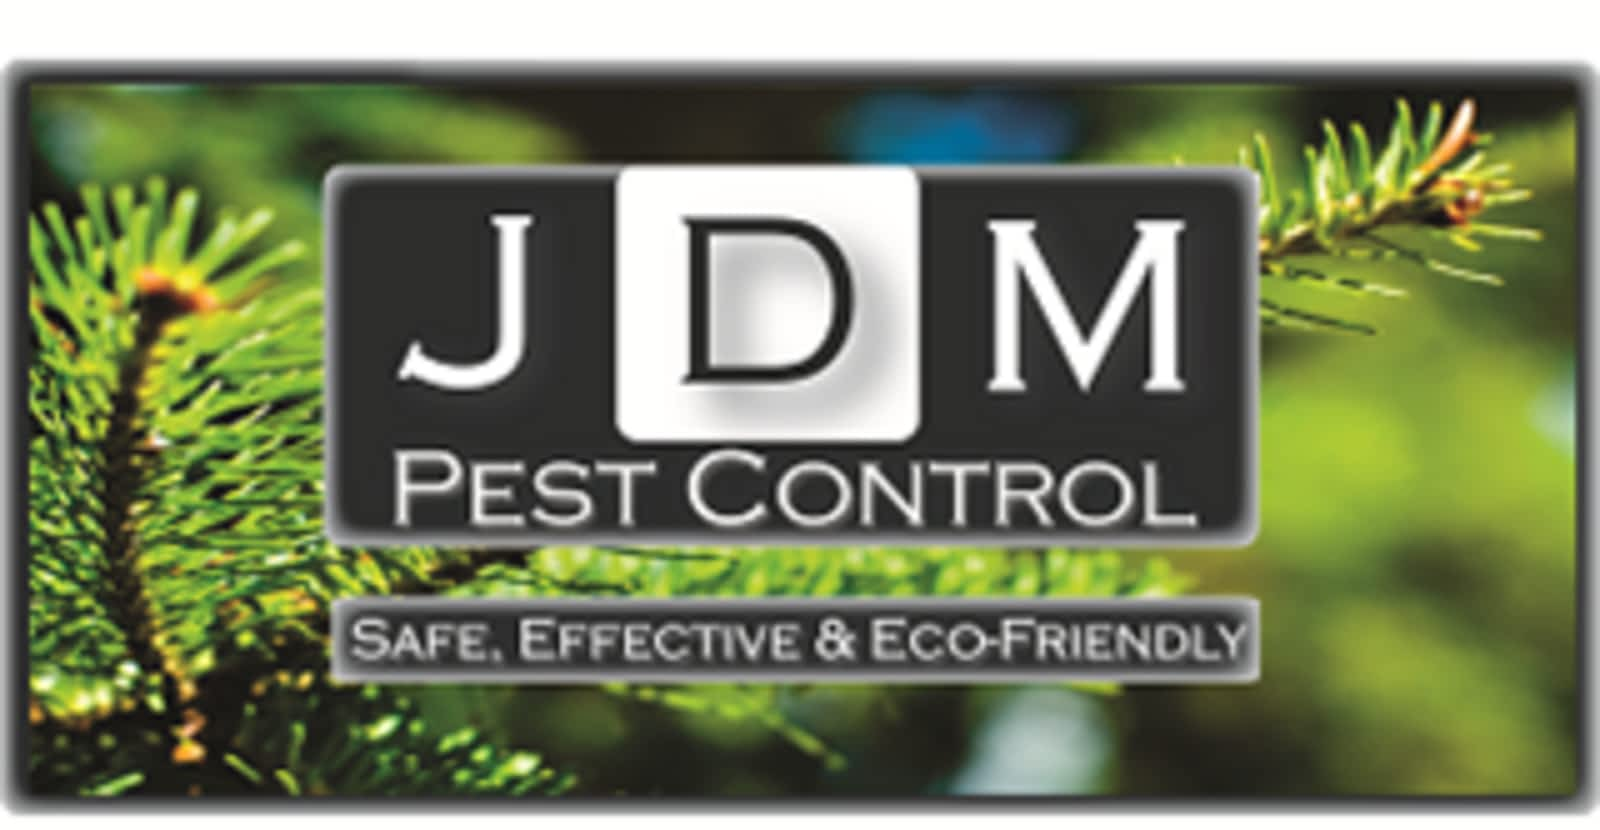 jdm-pest-control-1.jpg